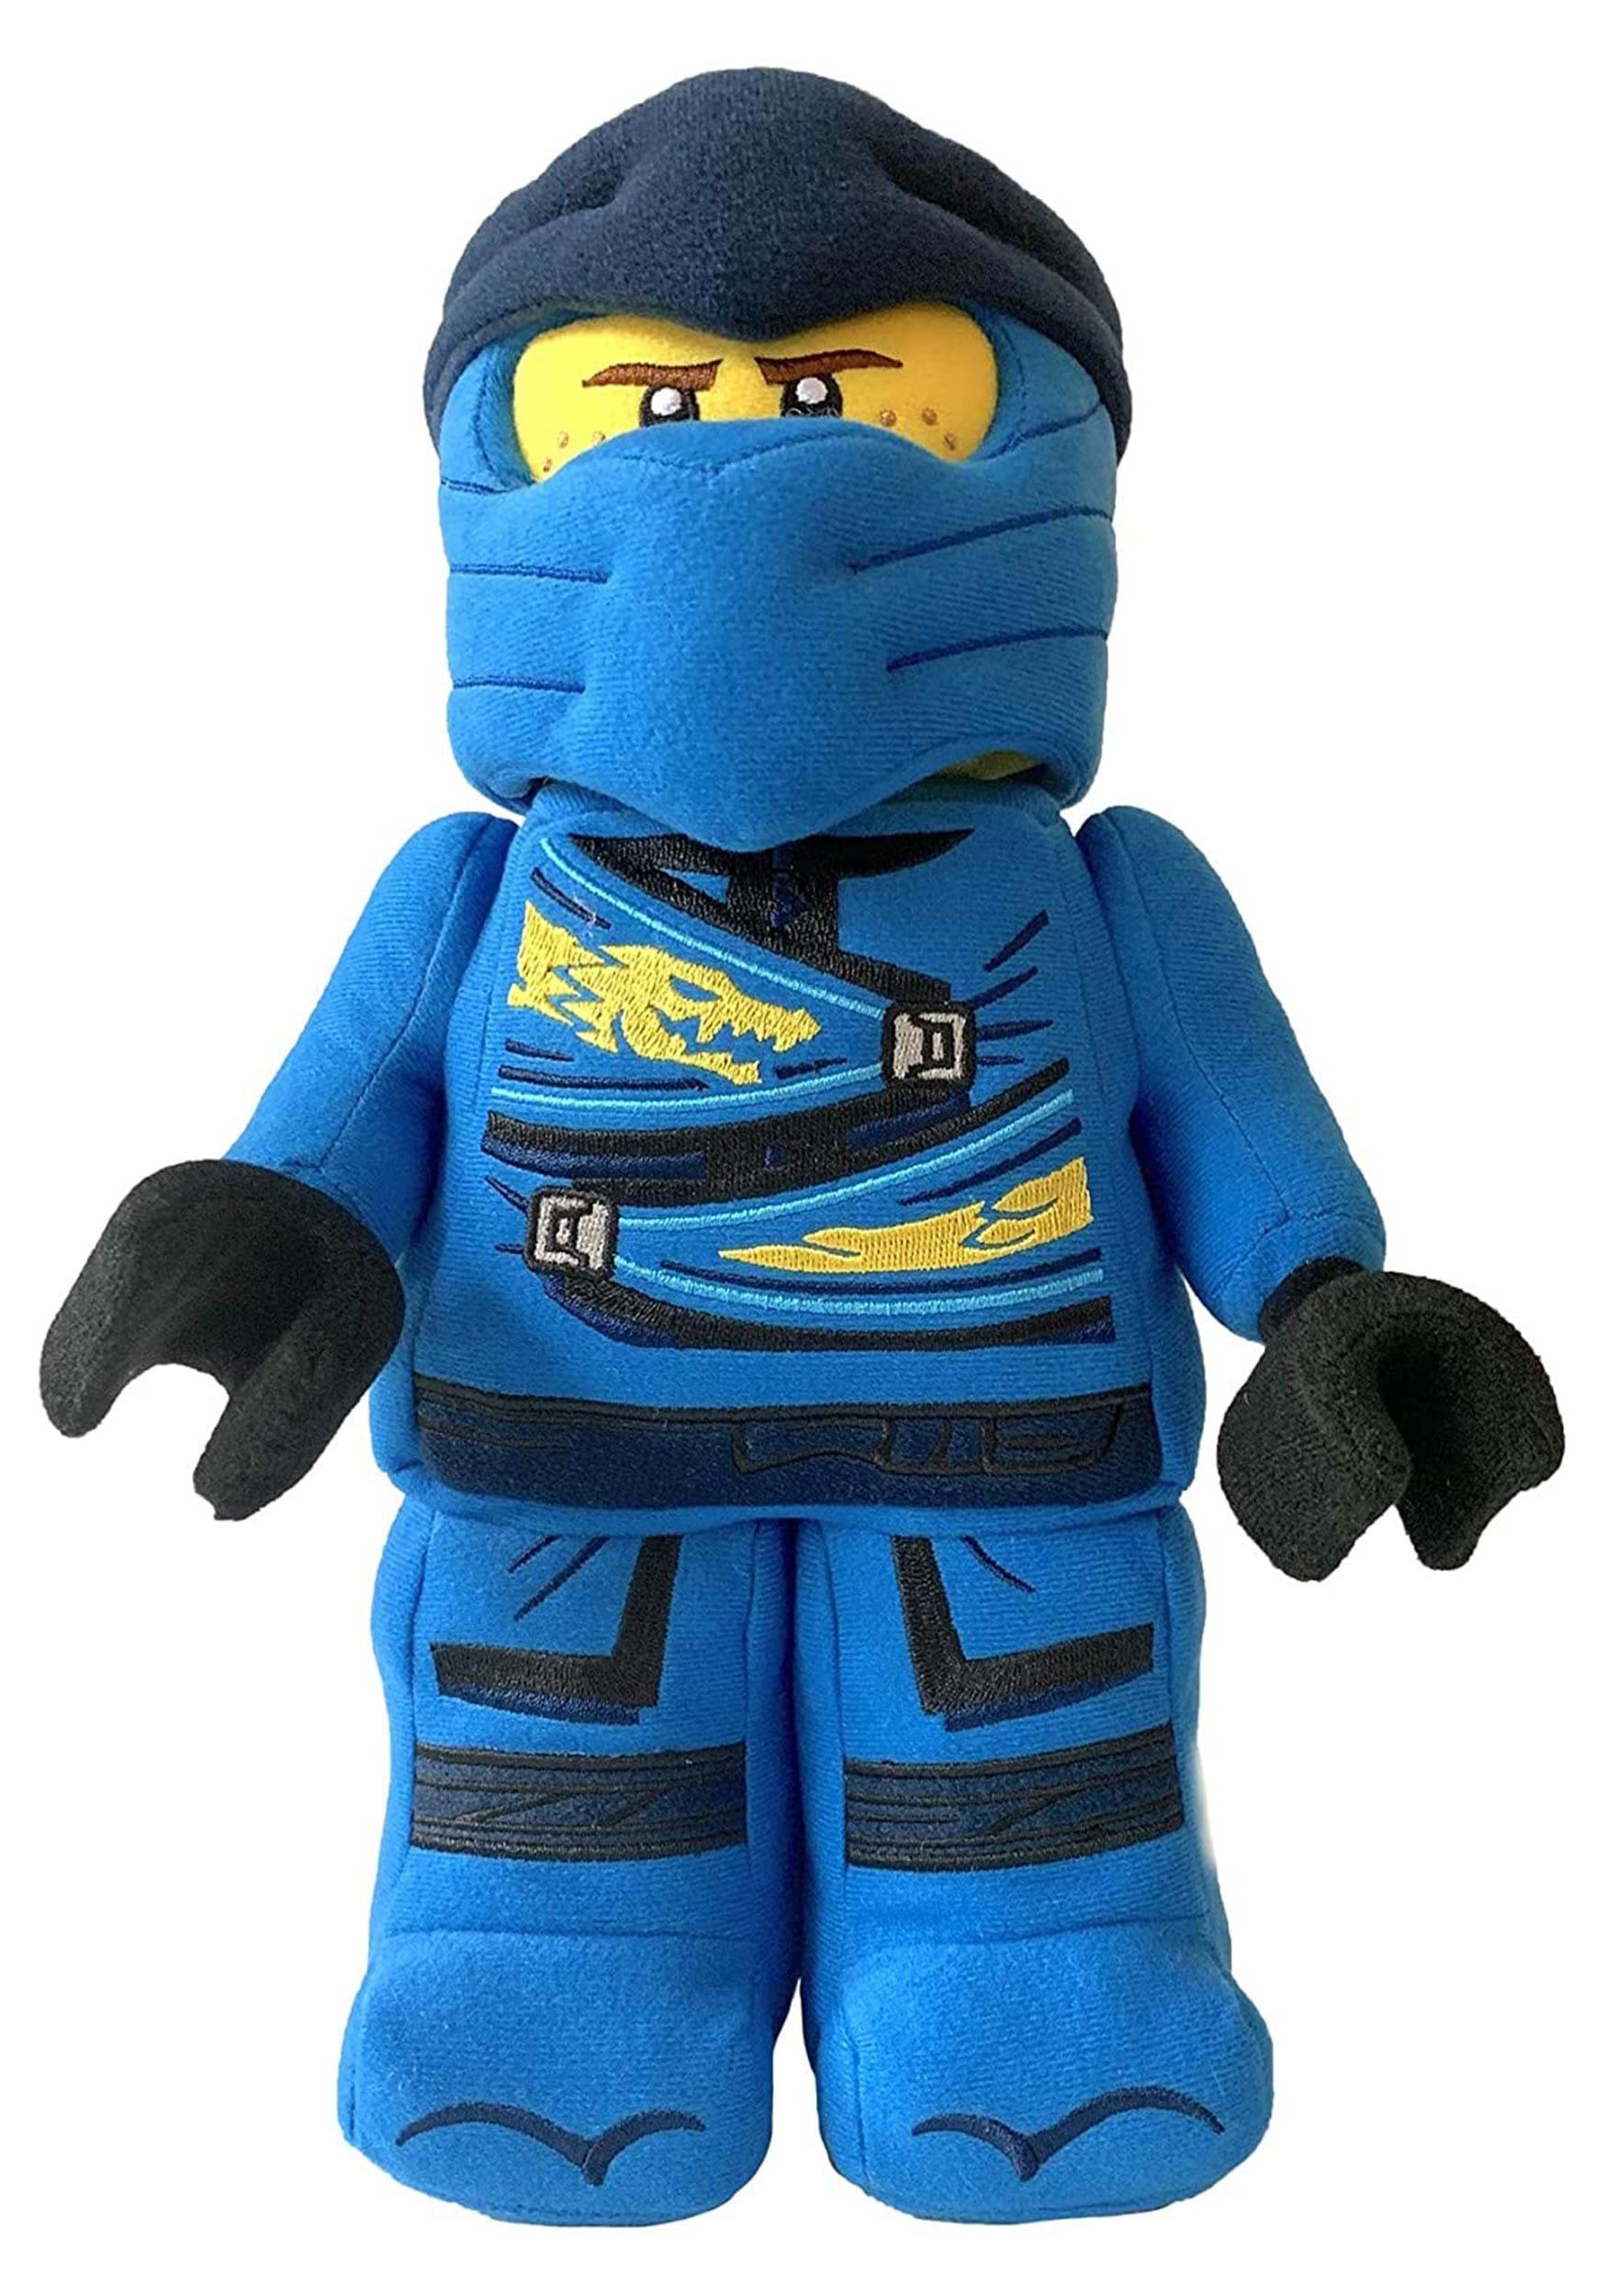 Ninjago- LEGO Jay Stuffed Figure